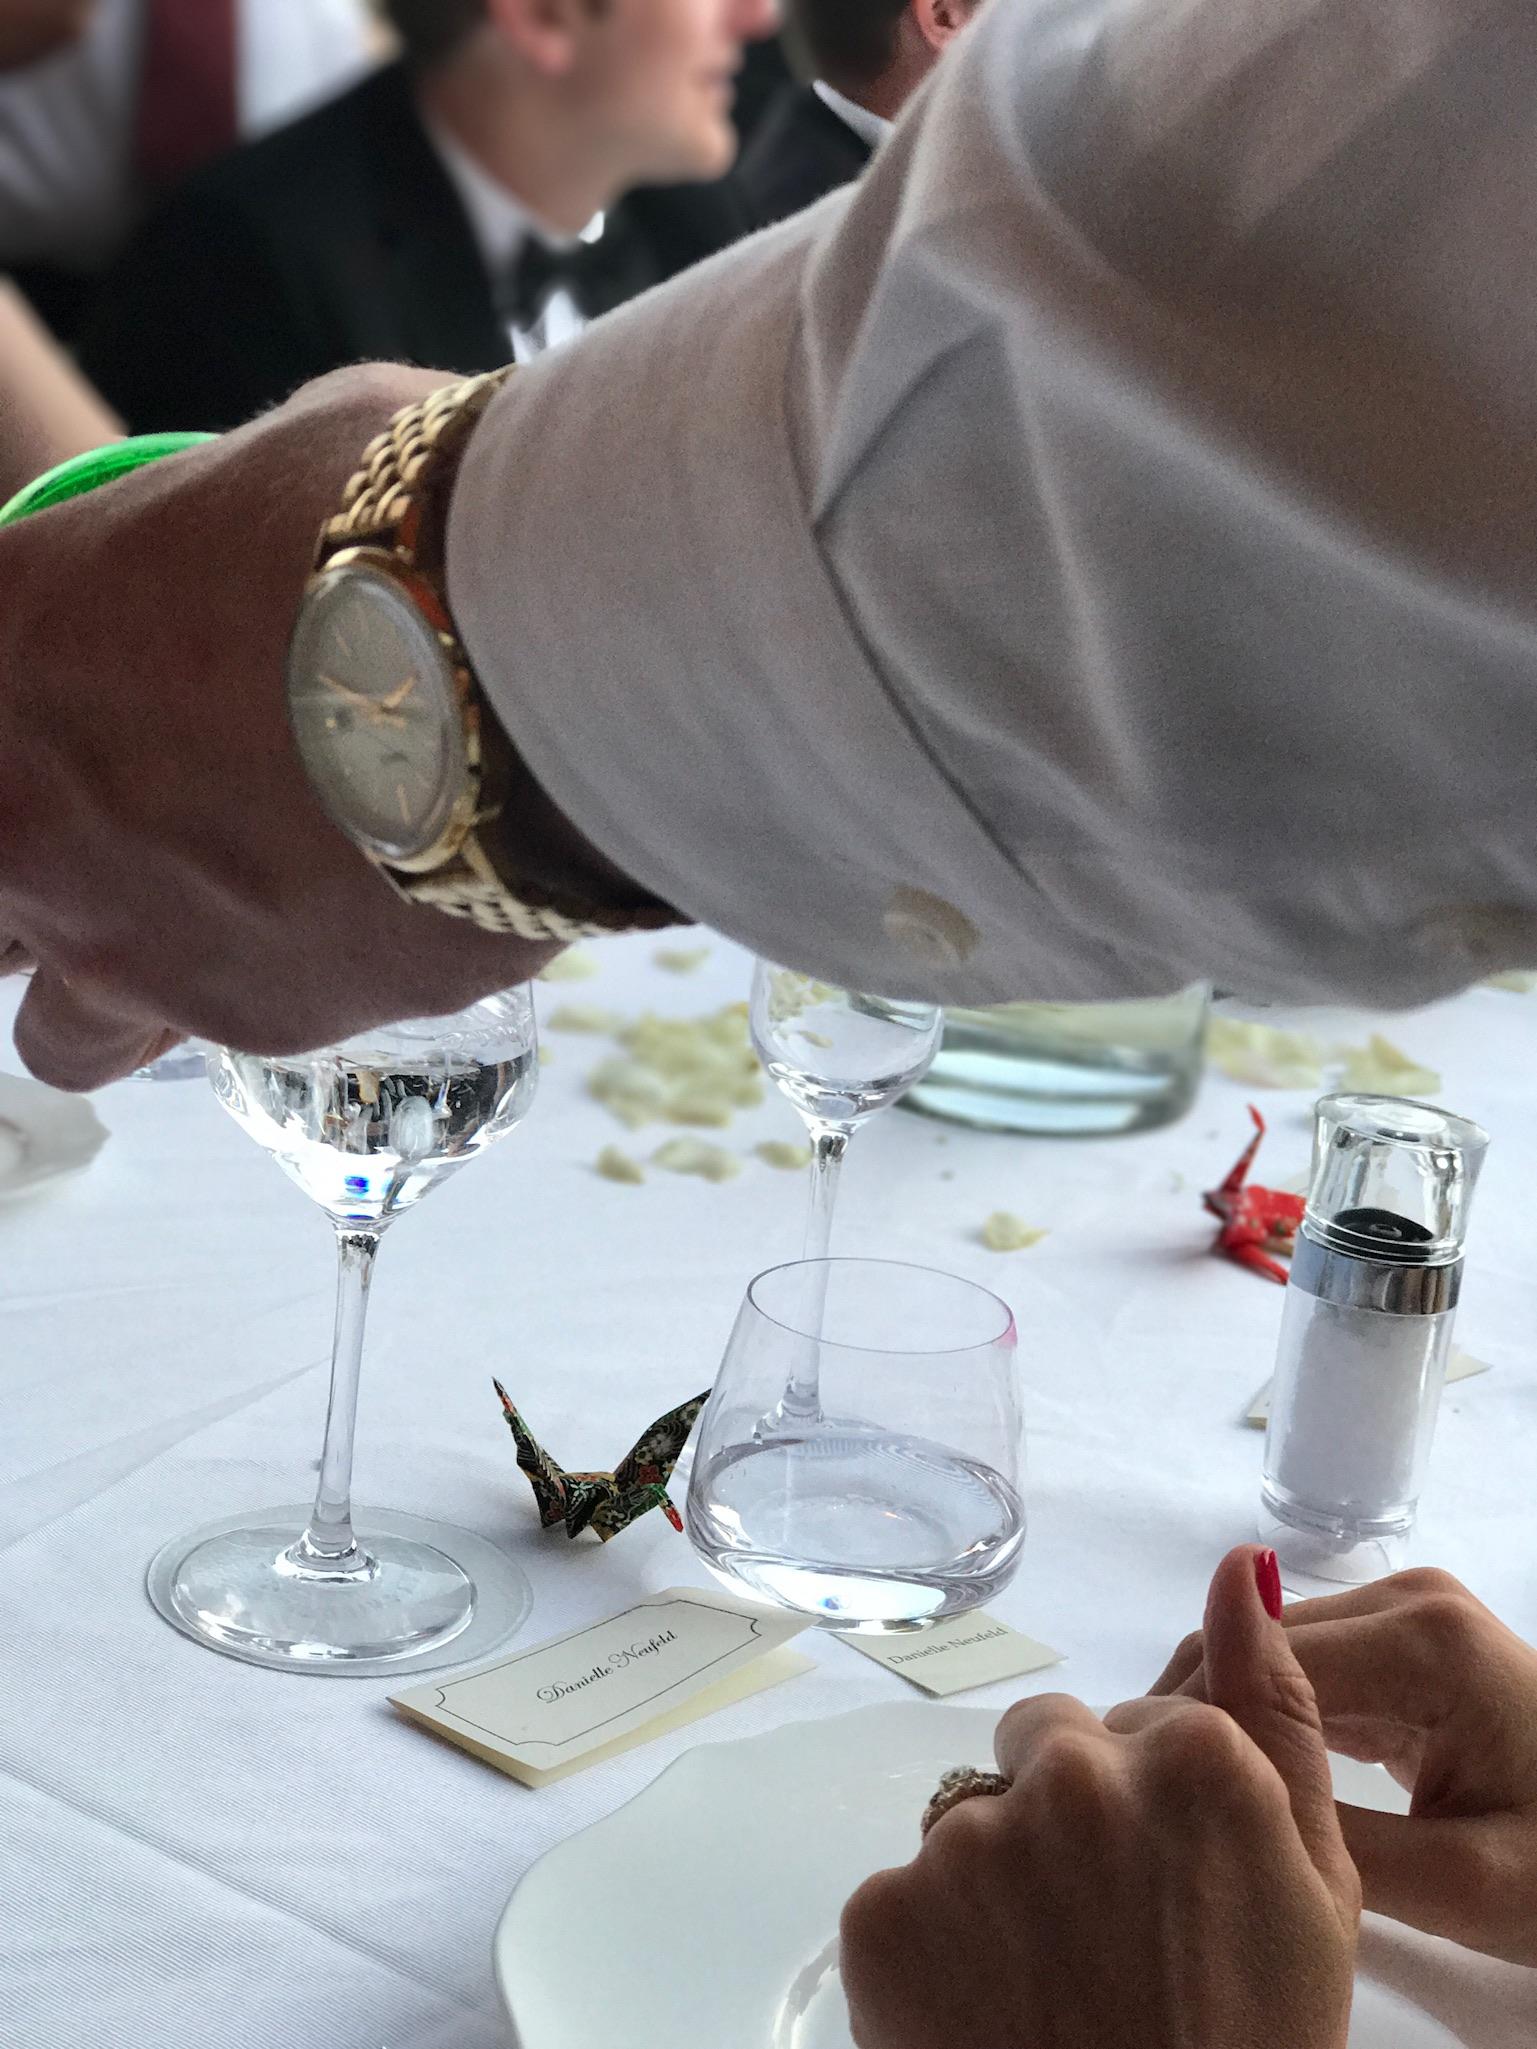 http://www.weddingamalfi.com/wp-content/uploads/Nathalie-and-Benjamin-Wedding-in-Positano-Italy-28.jpg